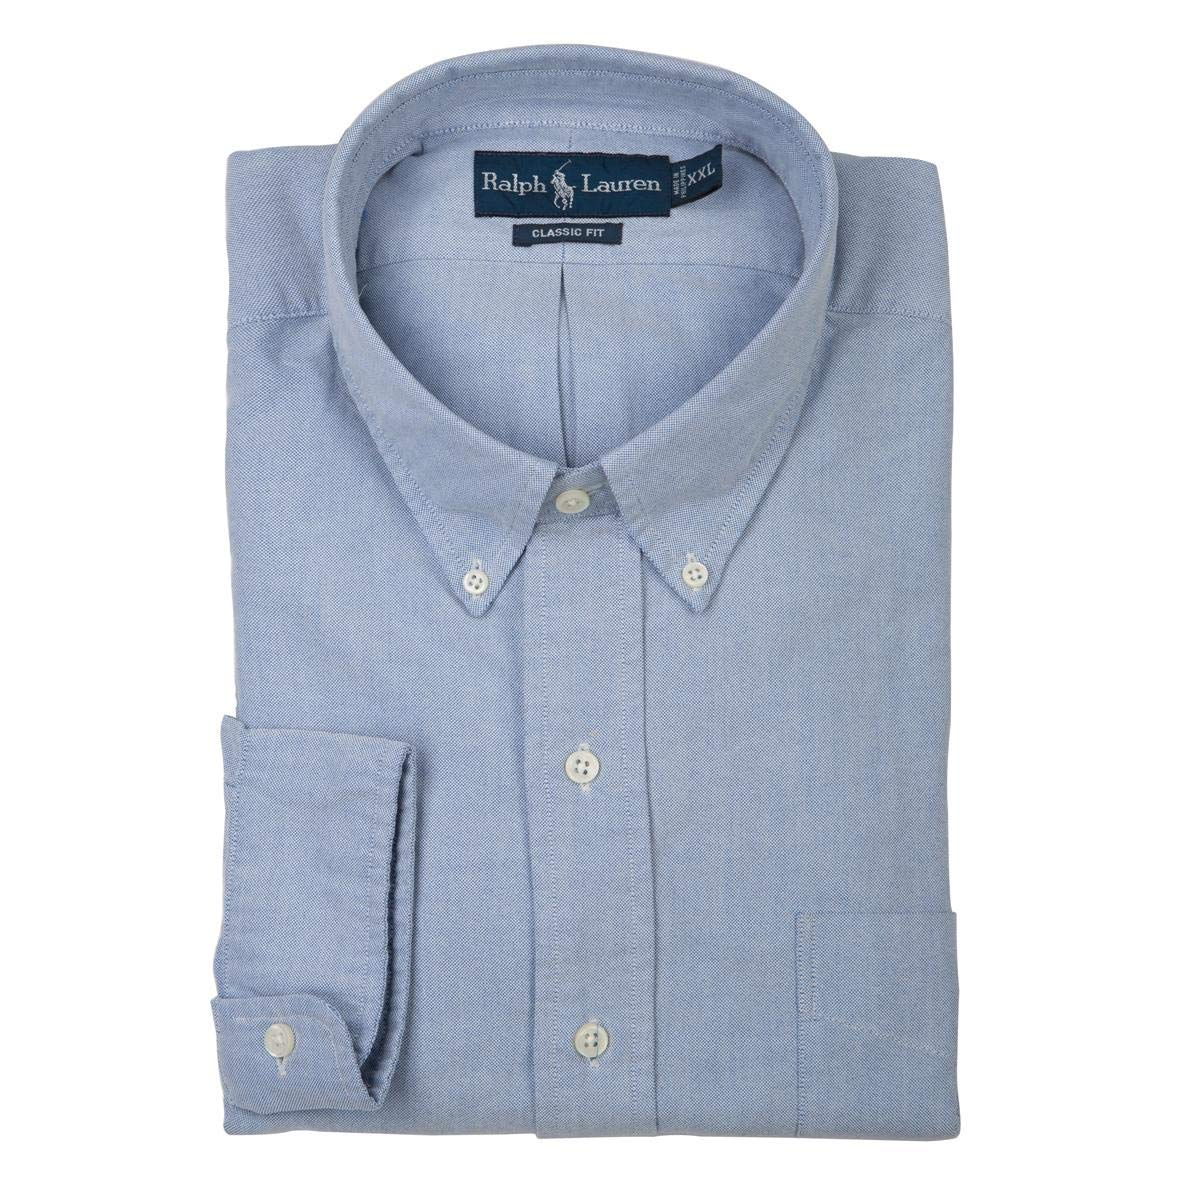 c51ed8e58 Polo Ralph Lauren Classic Fit Oxford Pony Dress Shirt For Men - XXL, Light  Blue: Amazon.ae: vintageframes